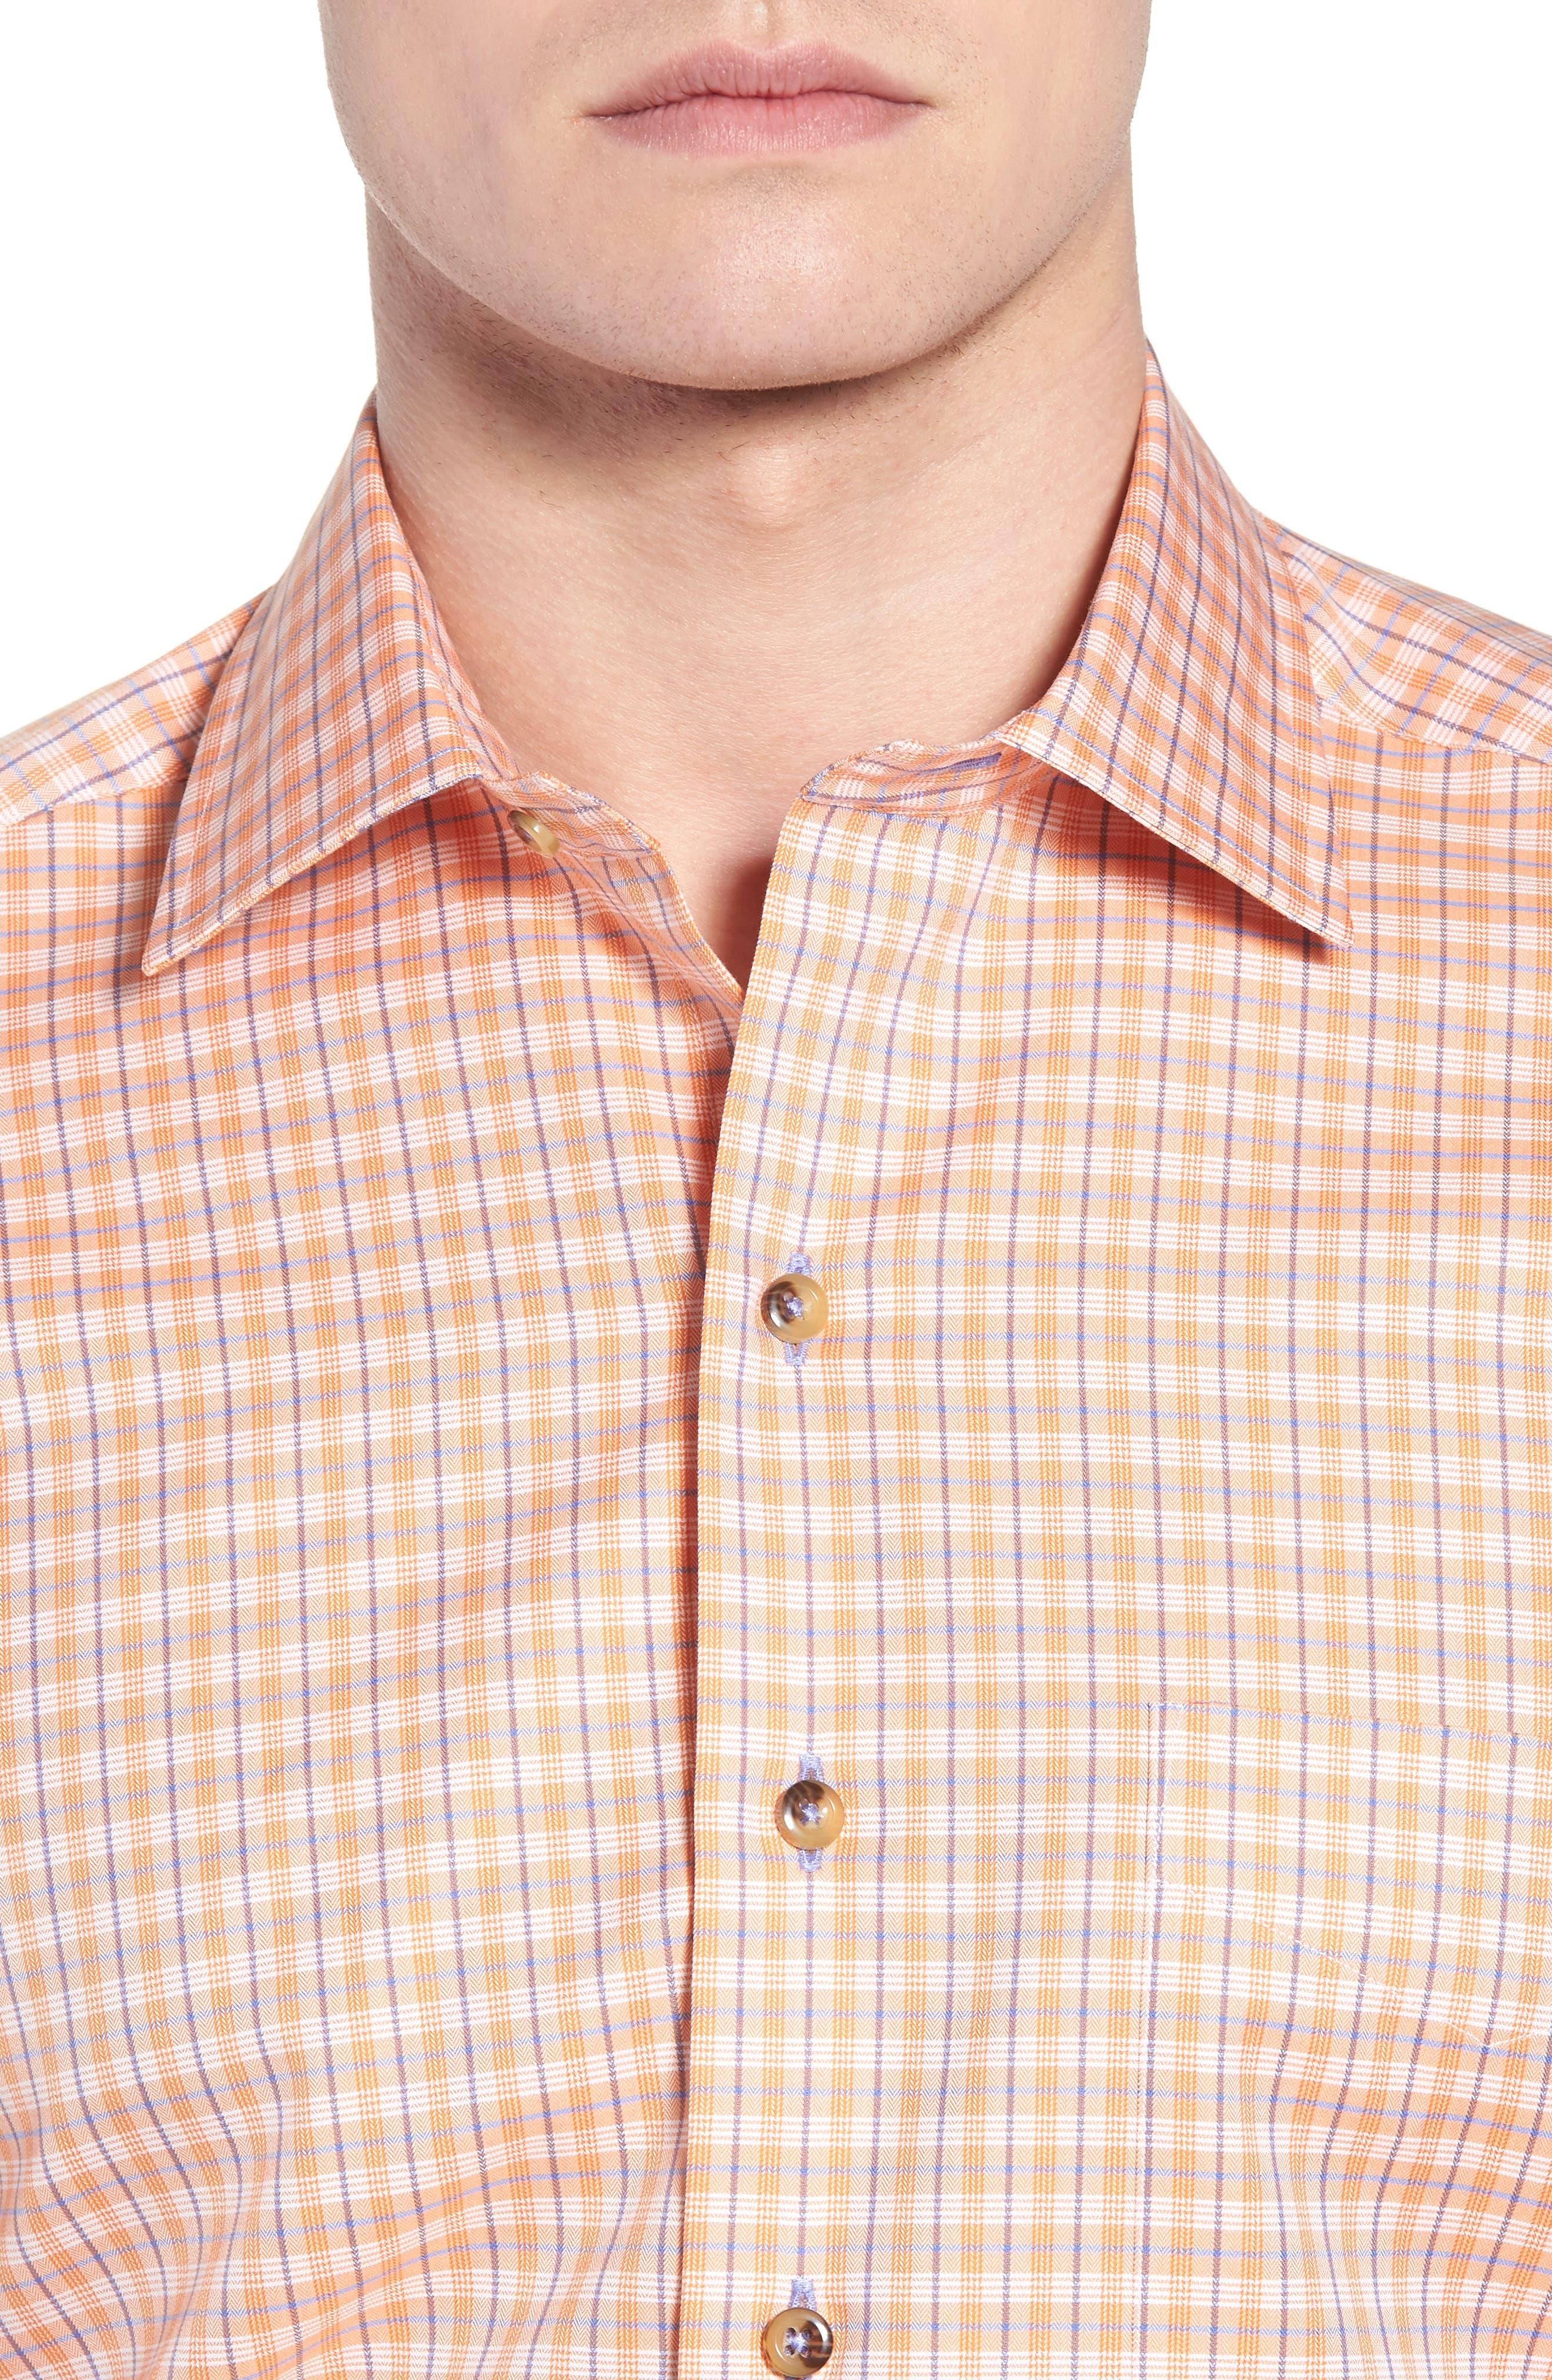 Regular Fit Plaid Sport Shirt,                             Alternate thumbnail 4, color,                             Melon